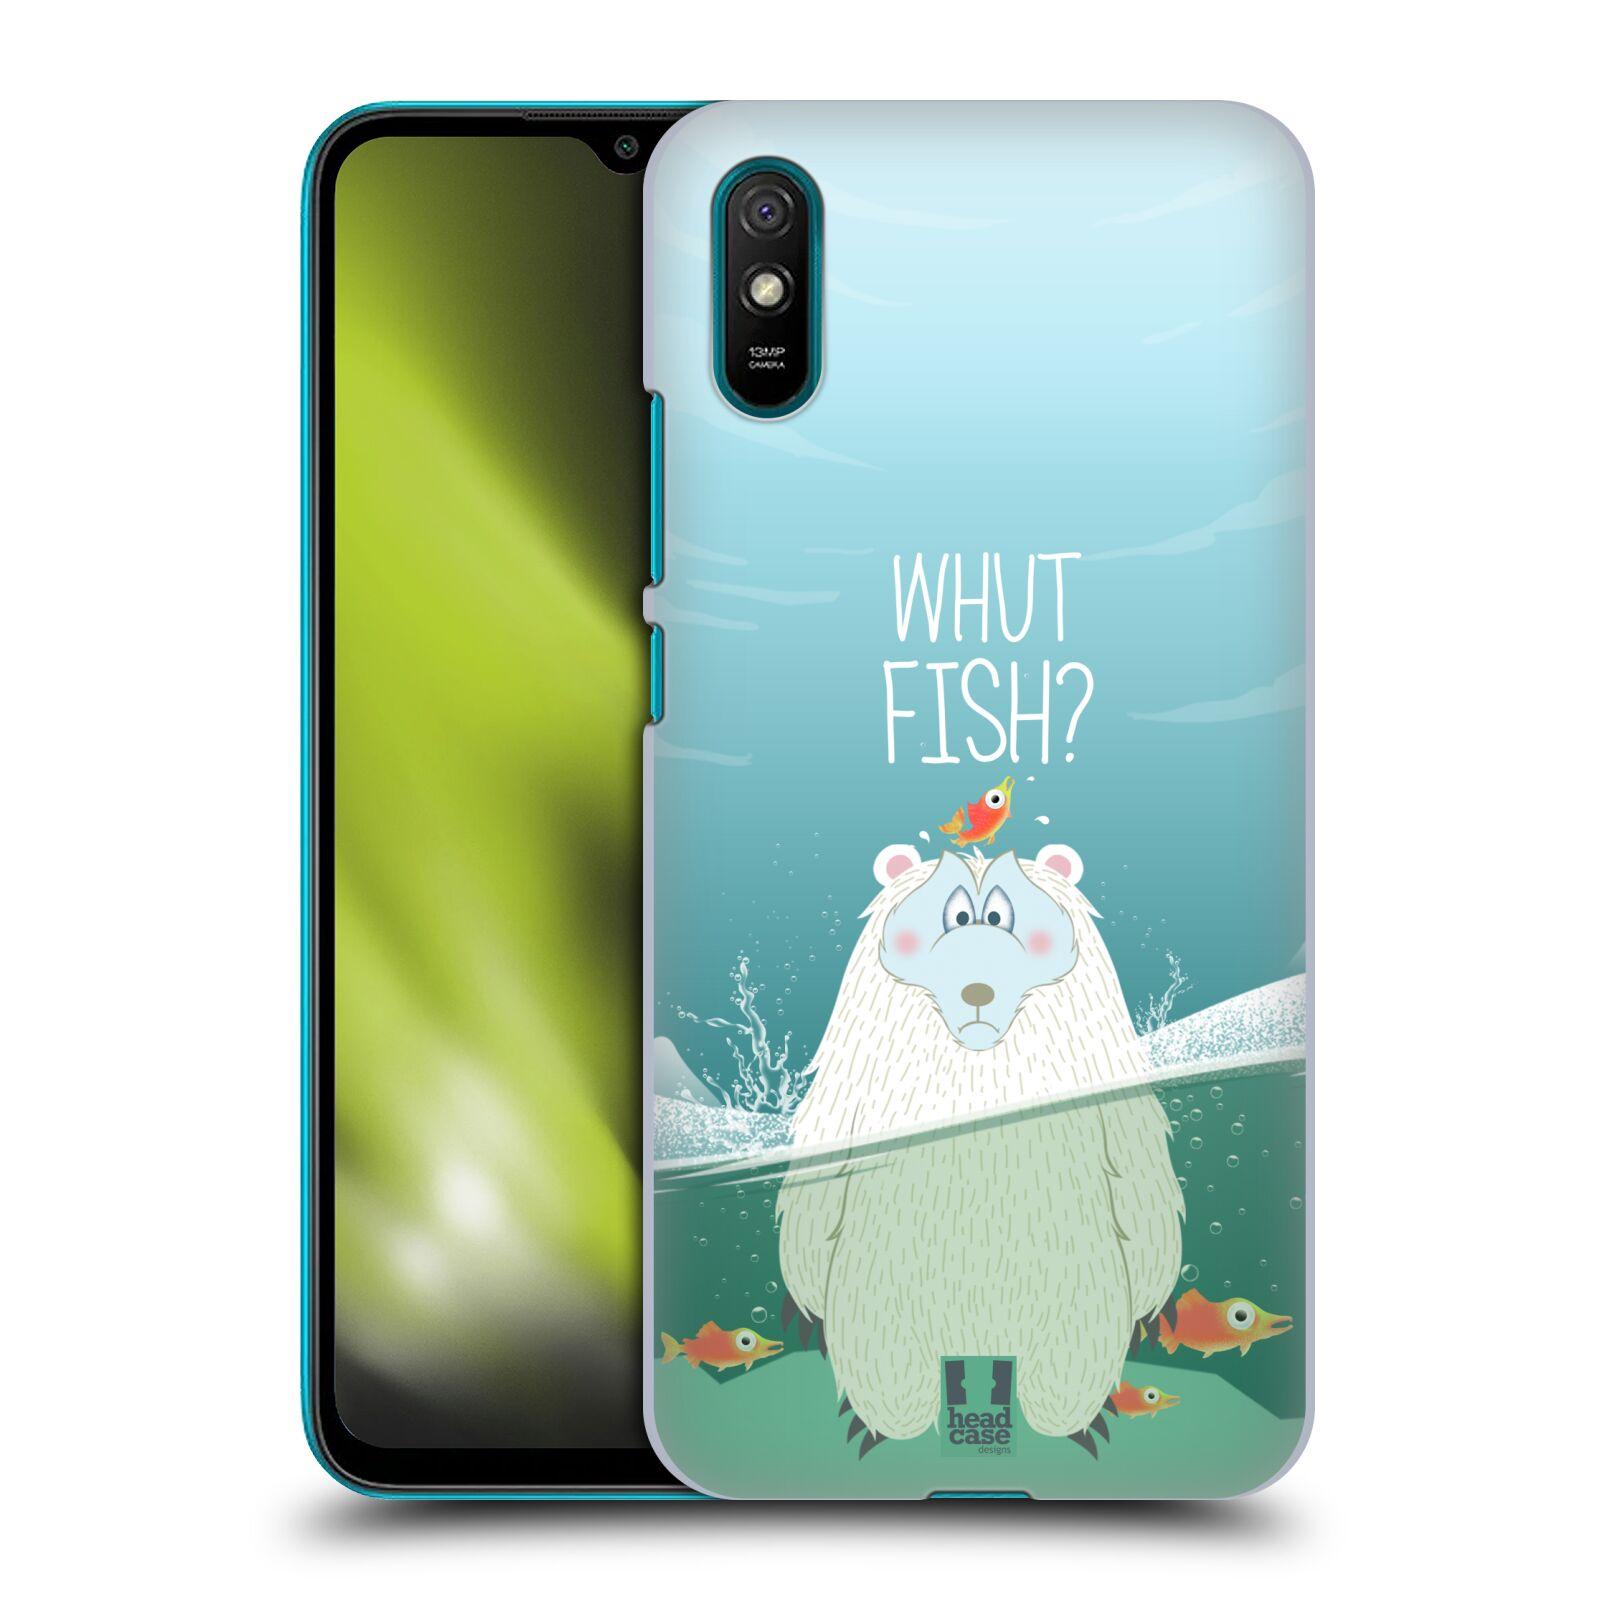 Plastové pouzdro na mobil Xiaomi Redmi 9A / Xiaomi Redmi 9AT - Head Case - Medvěd Whut Fish?